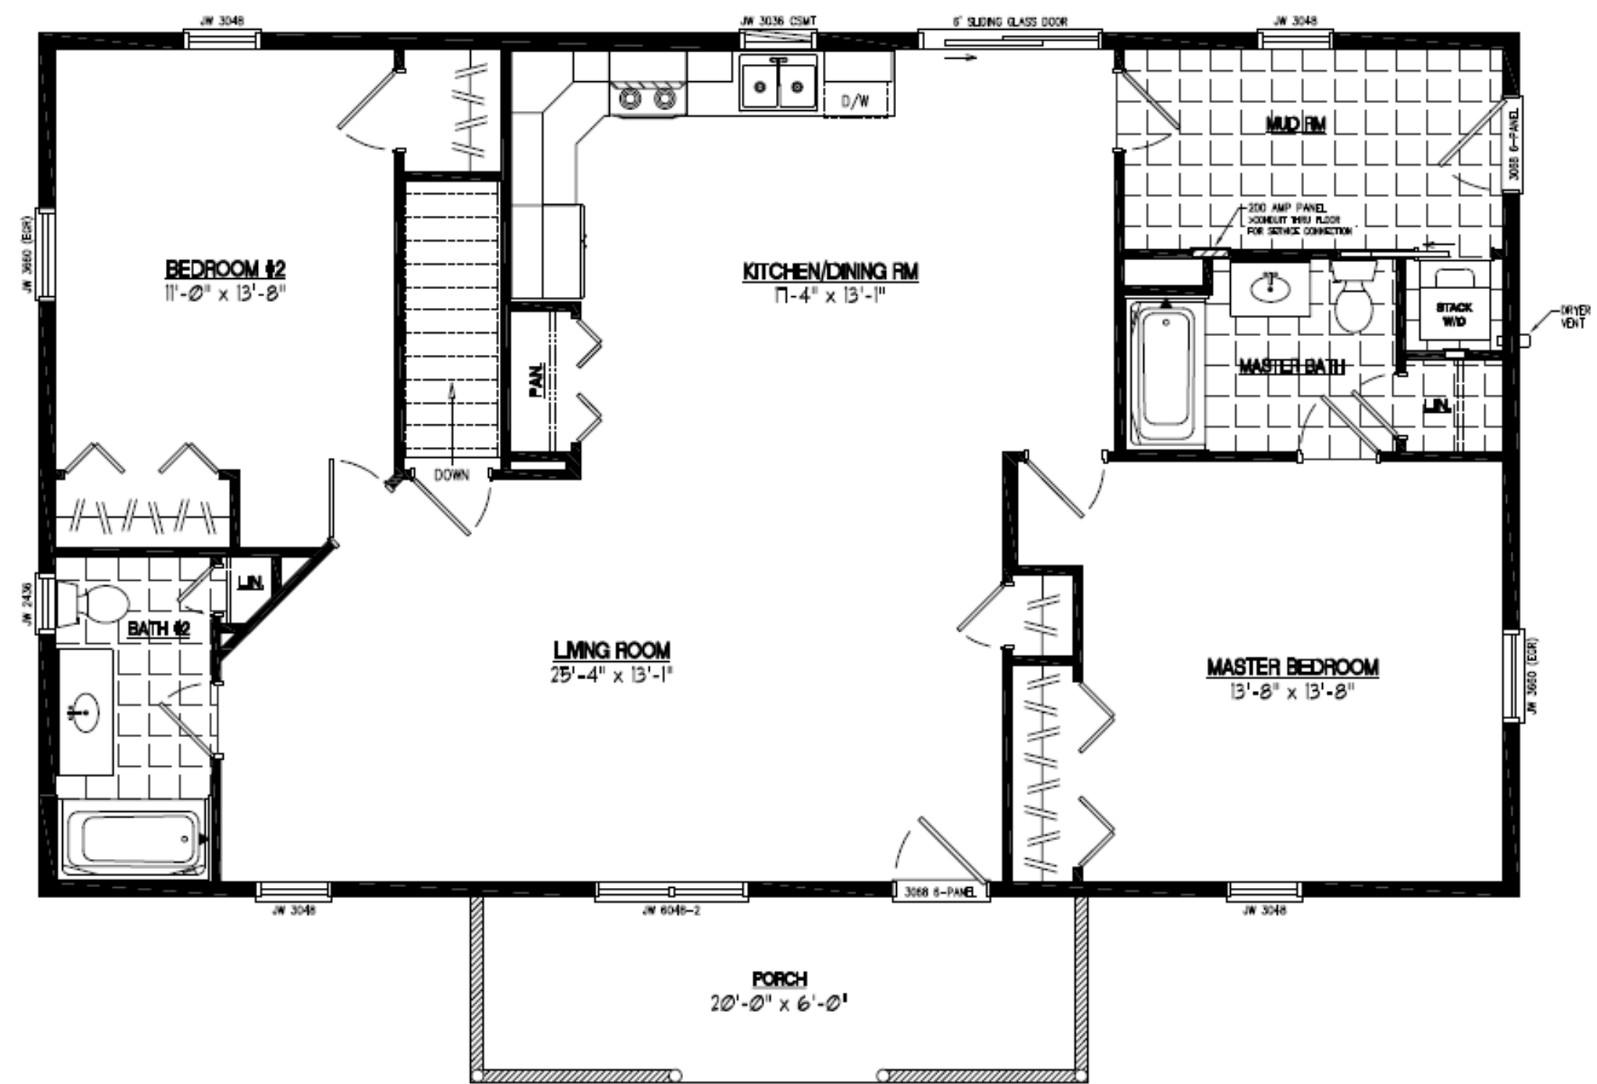 Endearing 60 barn home plans designs - Floor plans for barns set ...